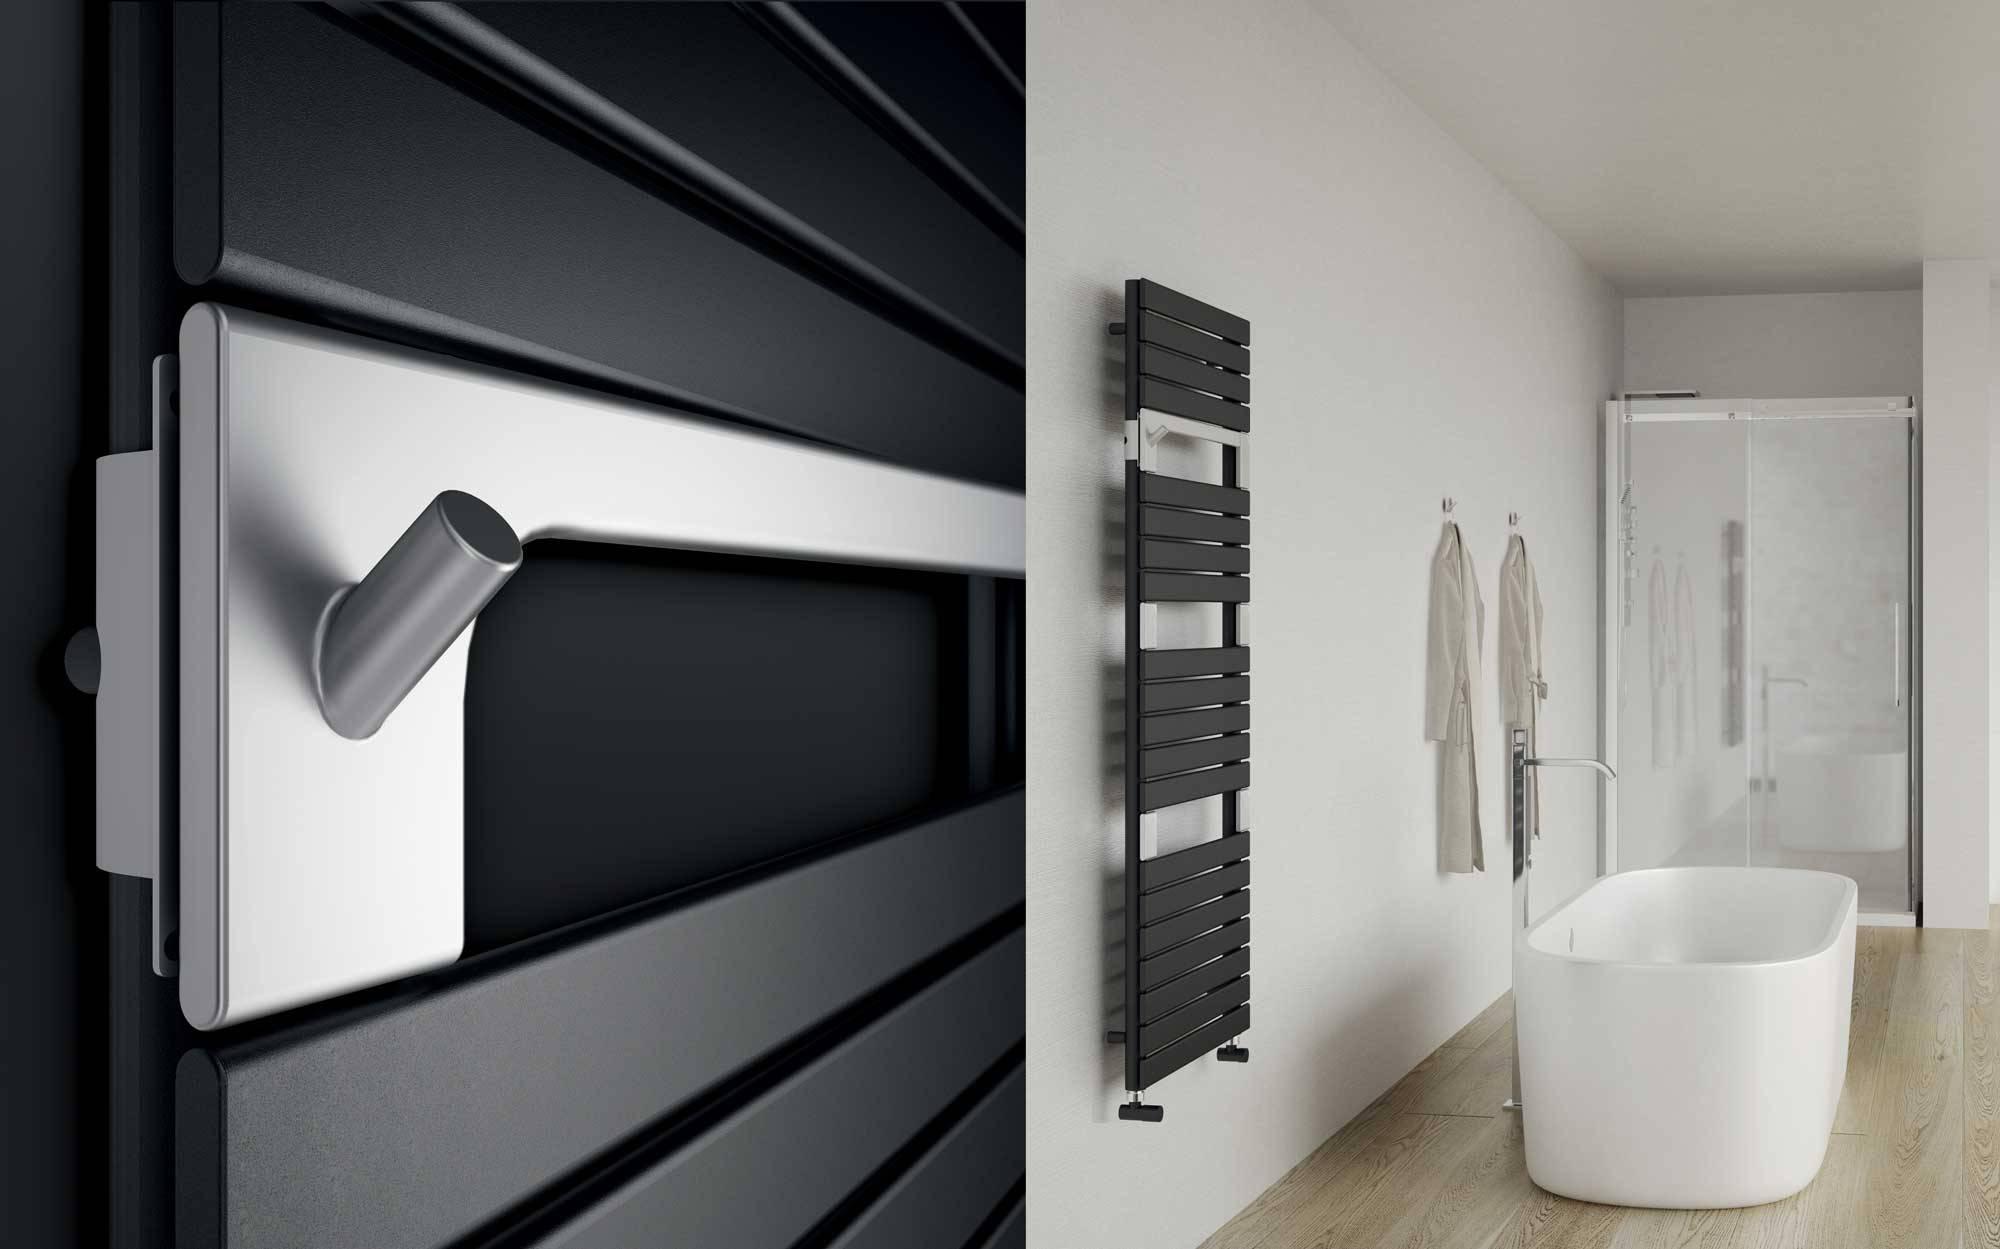 Sèche-serviettes Torino-anthracite-ambiance-bathroom-and-closeup